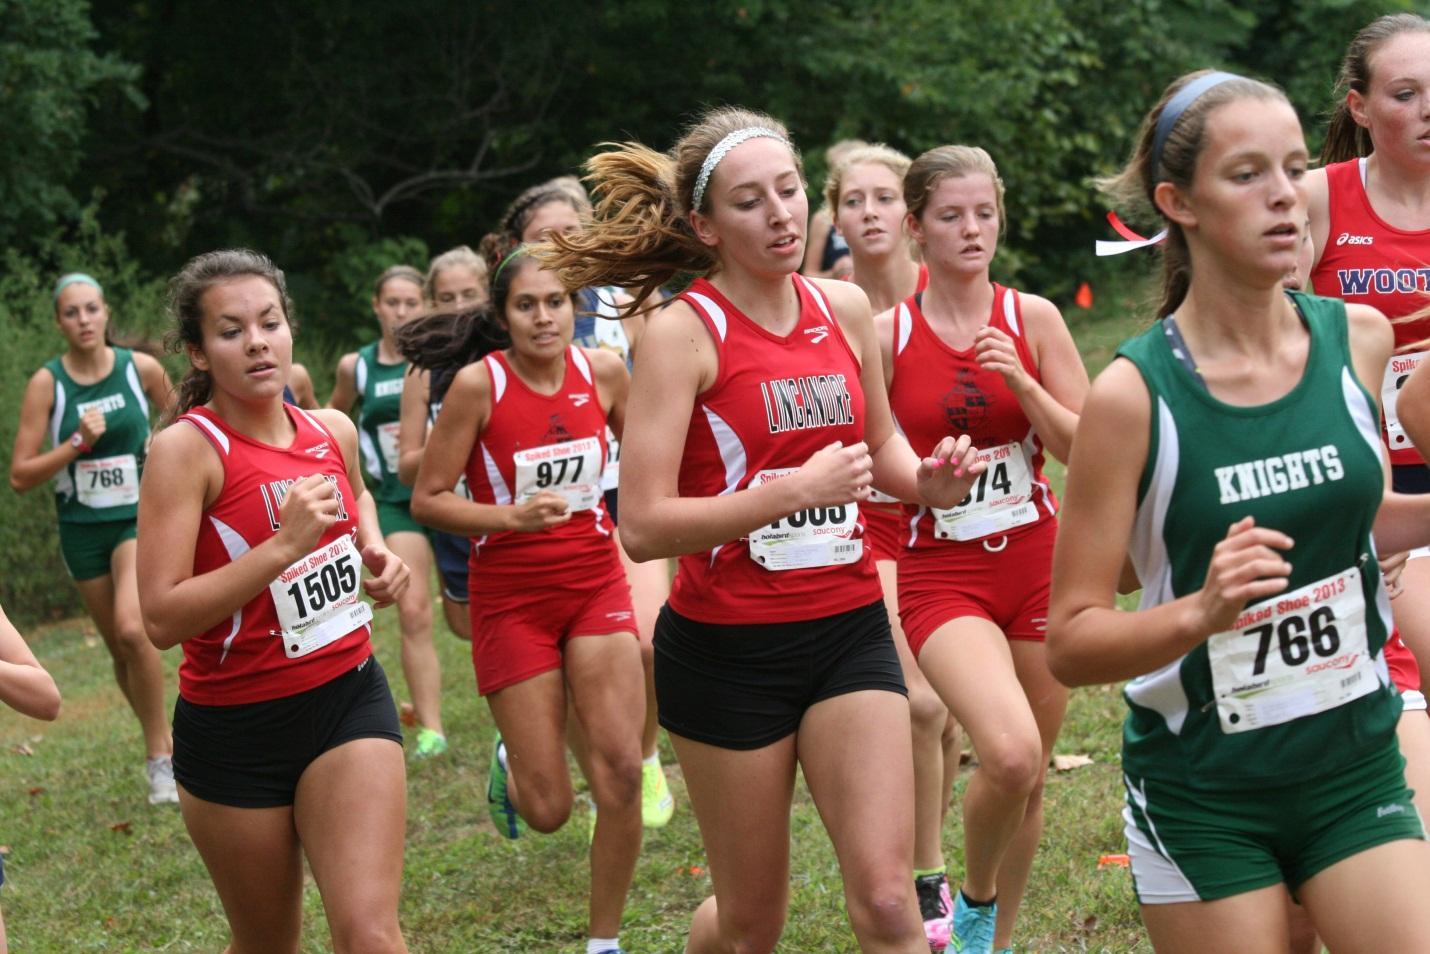 Juniors Abby Lyons (left) and Sydney Garwood (right) compete in the Johns Hopkins race September 21. Photo courtesy of Luke Garwood.